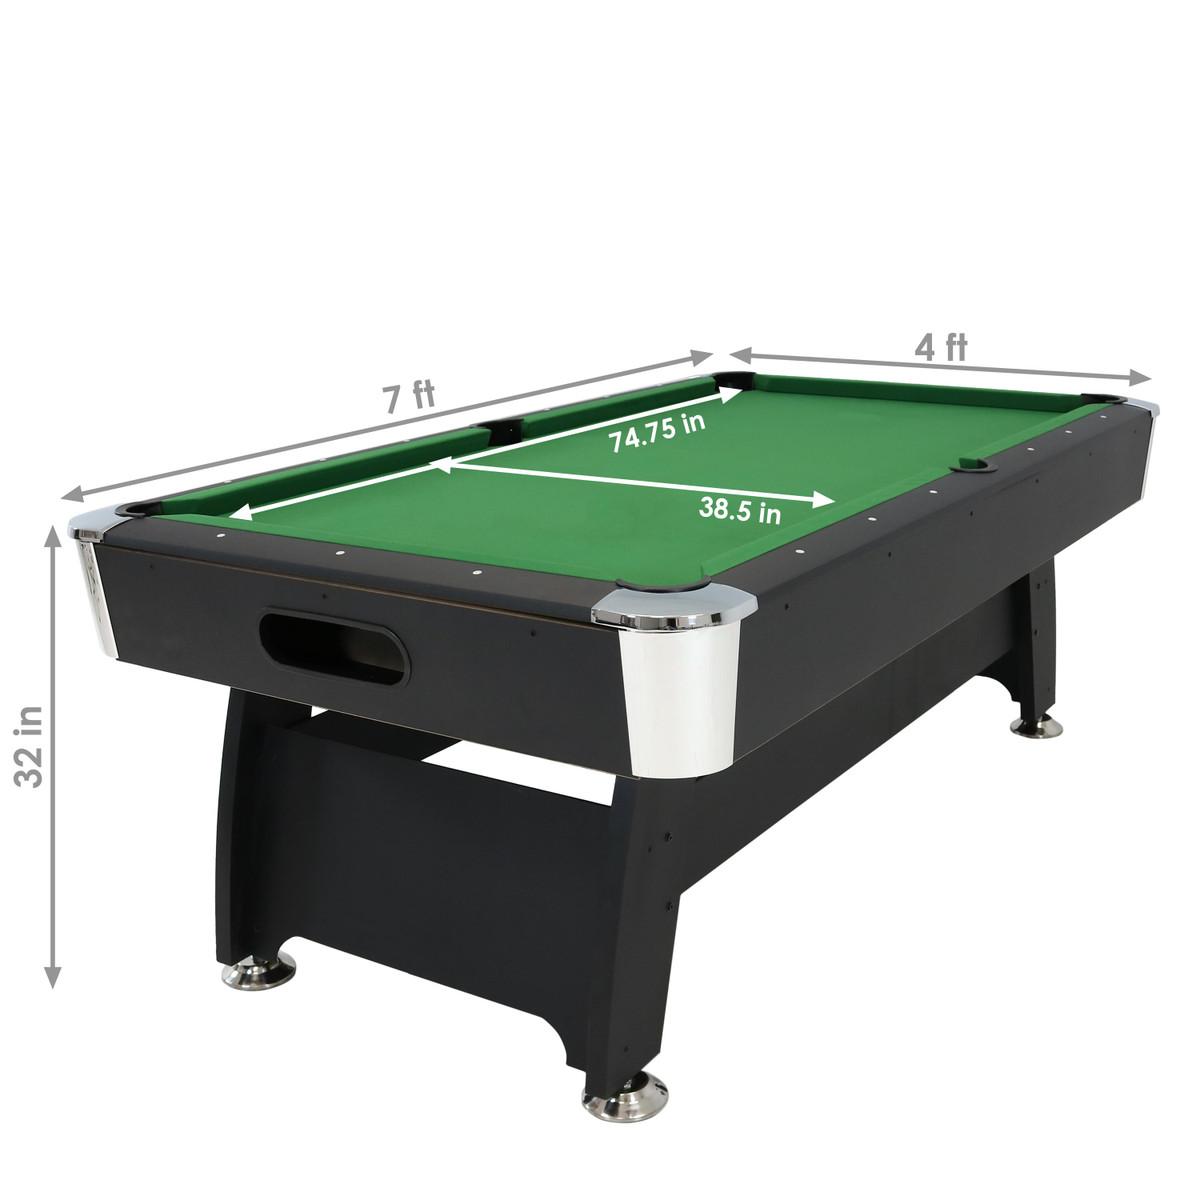 Pool Snooker Billiard Cleaning Accessories Billiard Table Brush Kit Wooden Long Handle Indoor Table Rail Brush Set